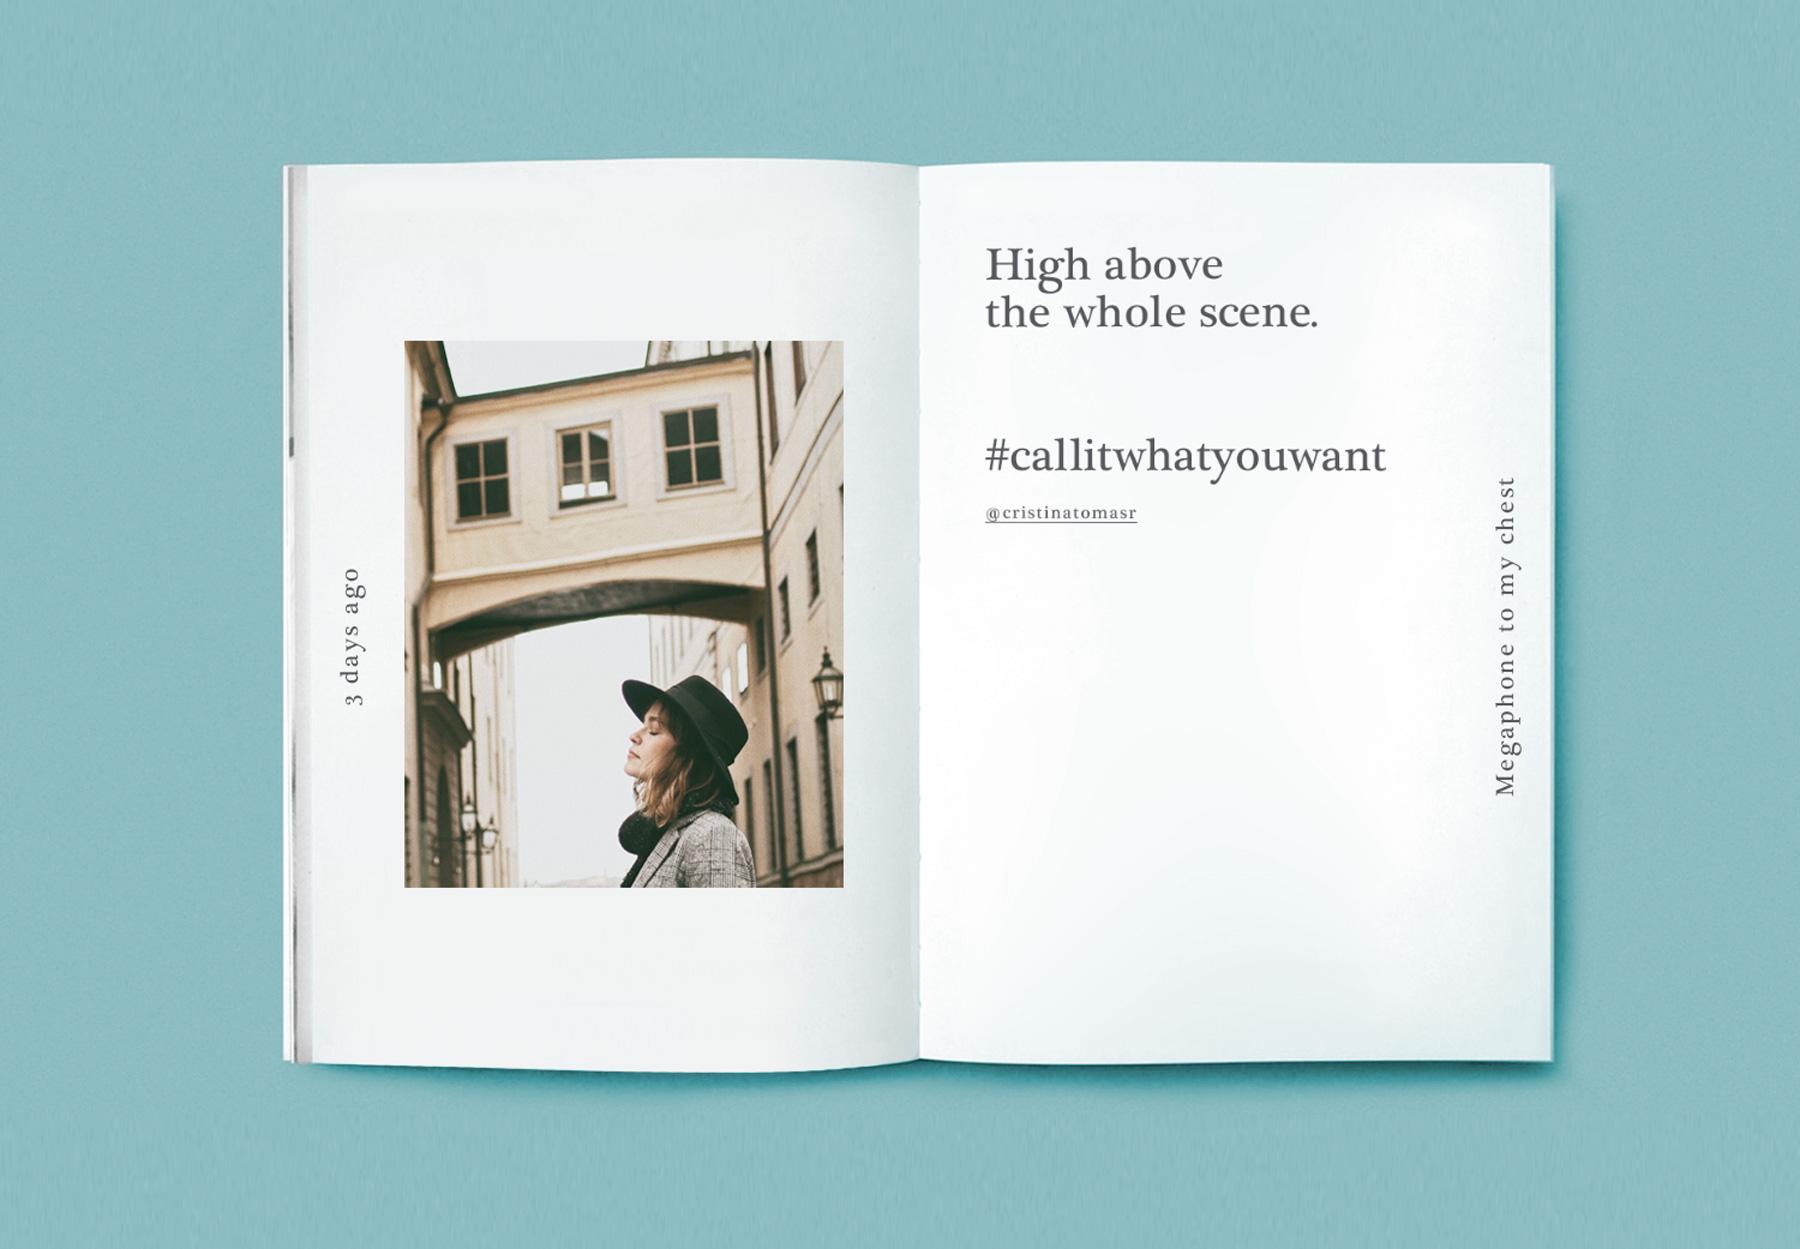 diseño editoriarl interior fanzine